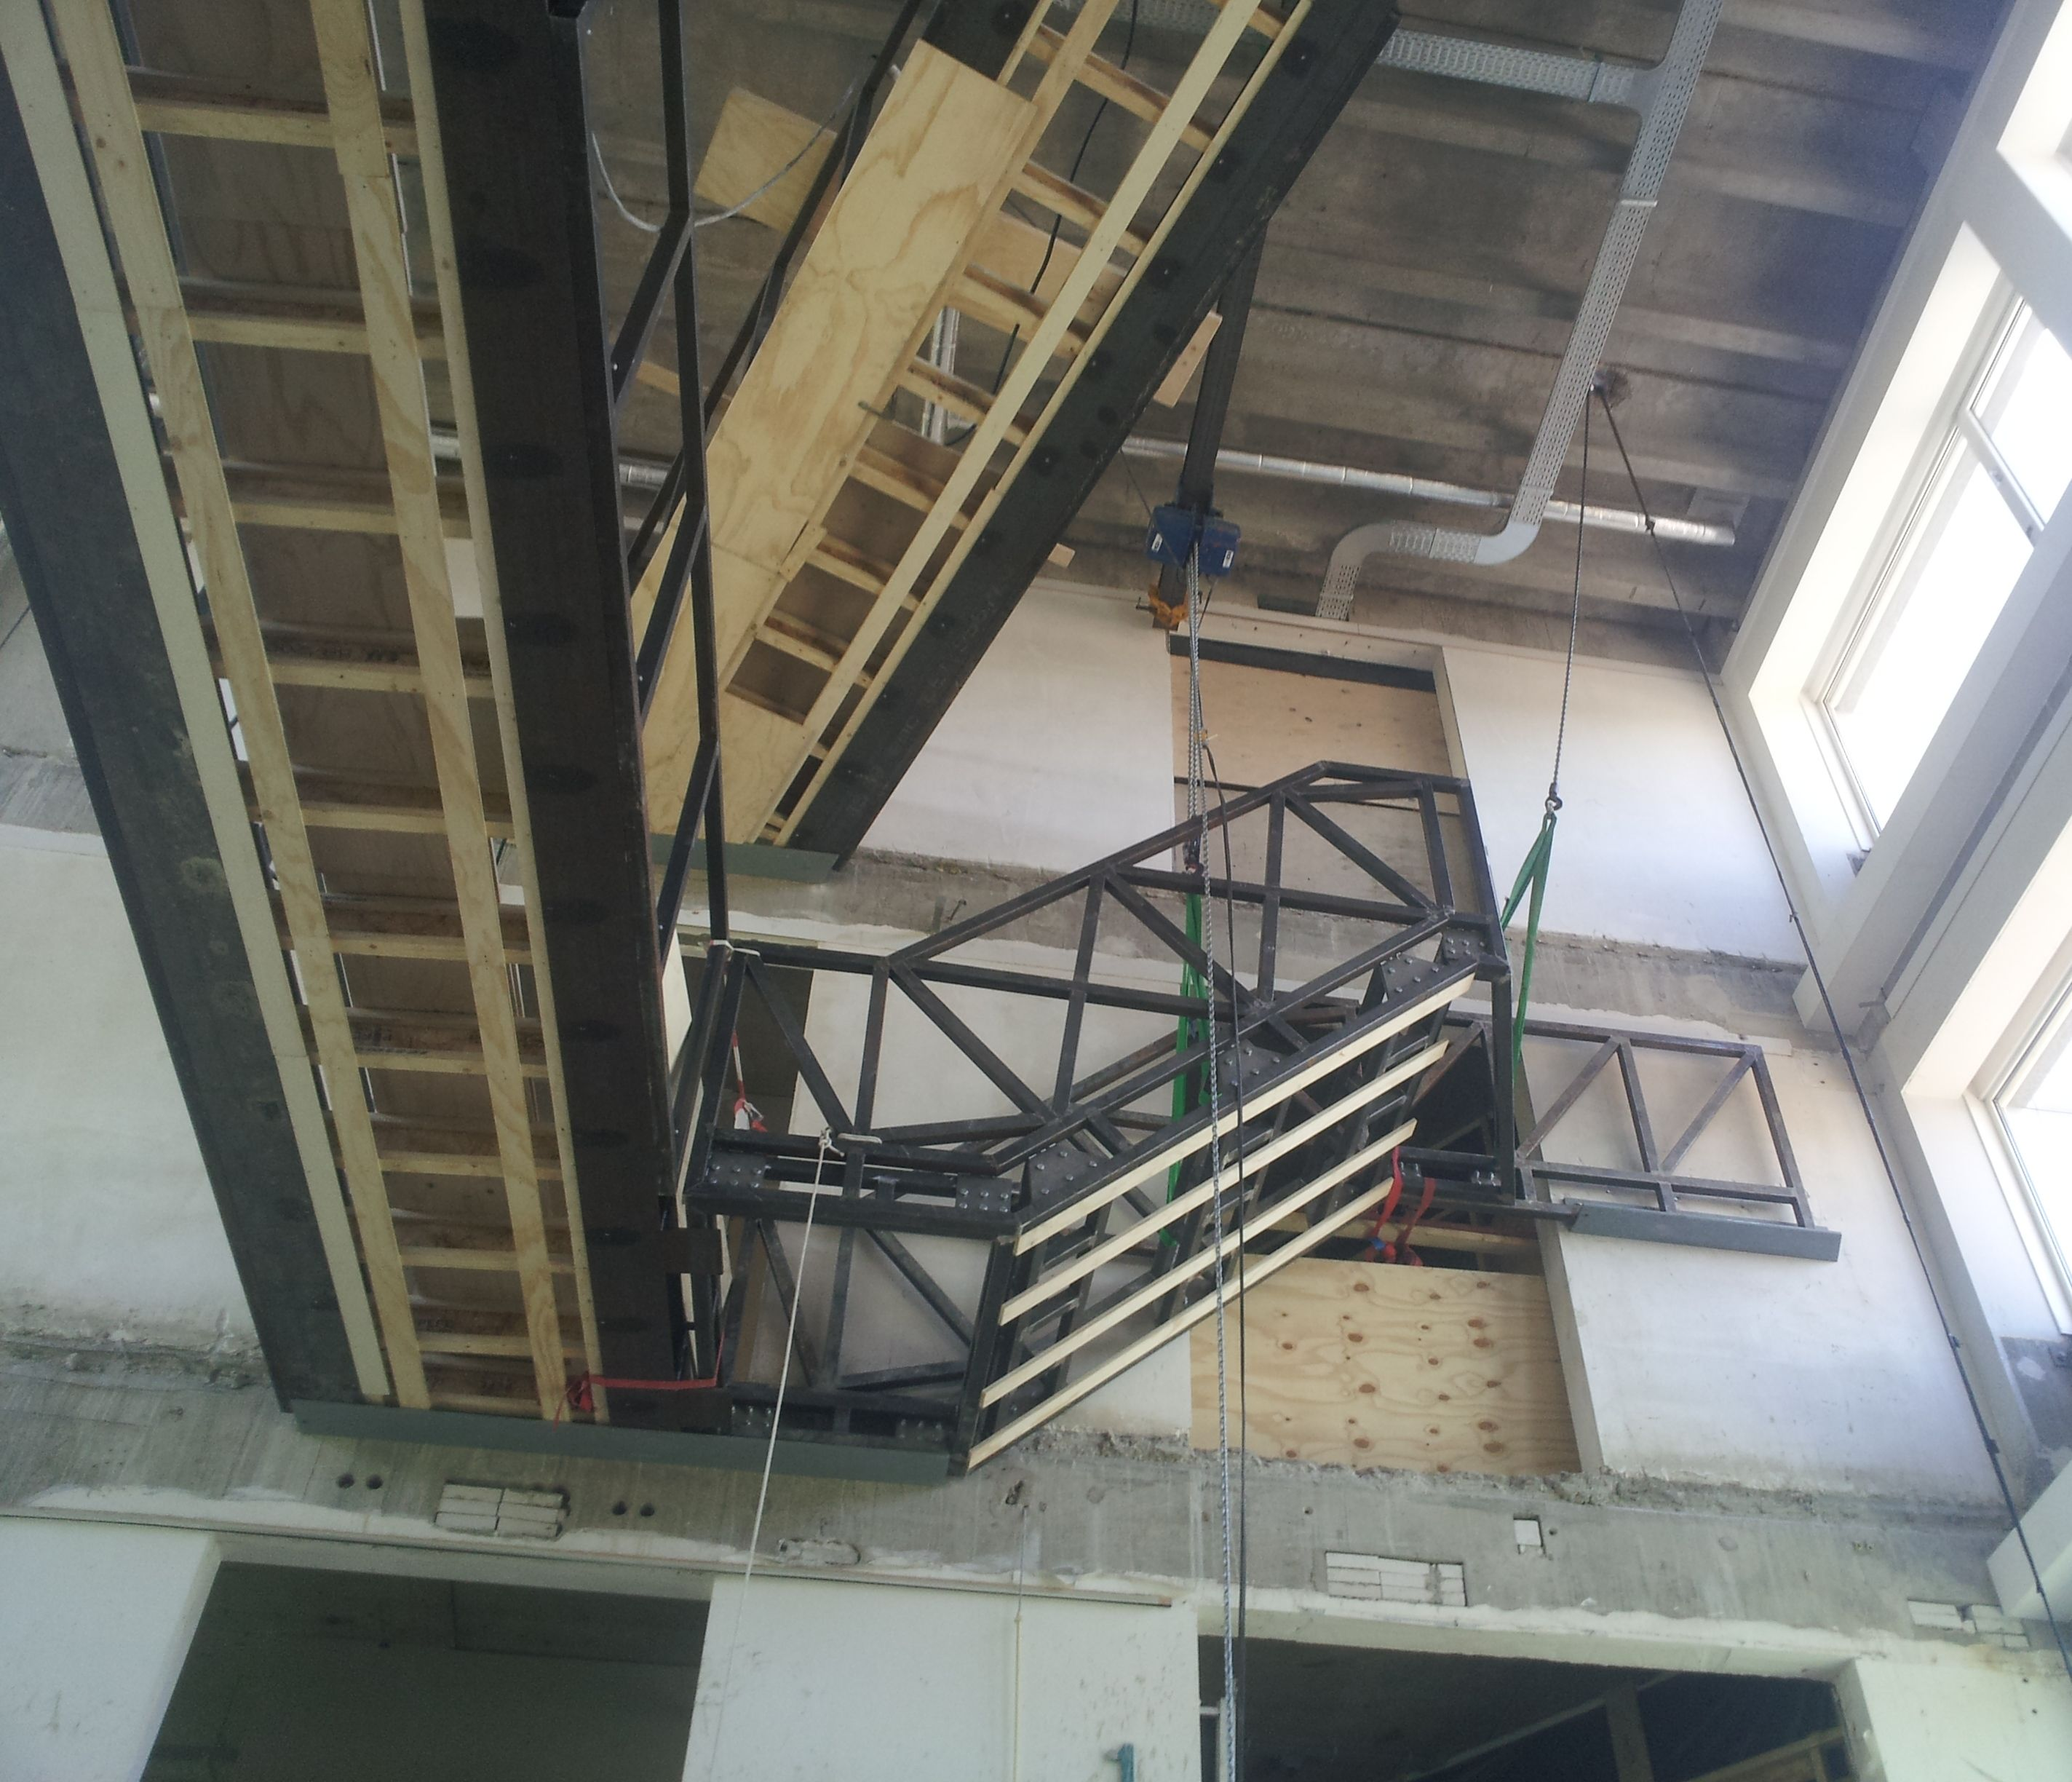 Spectaculaire trap in nieuwe hal » bouwwereld.nl